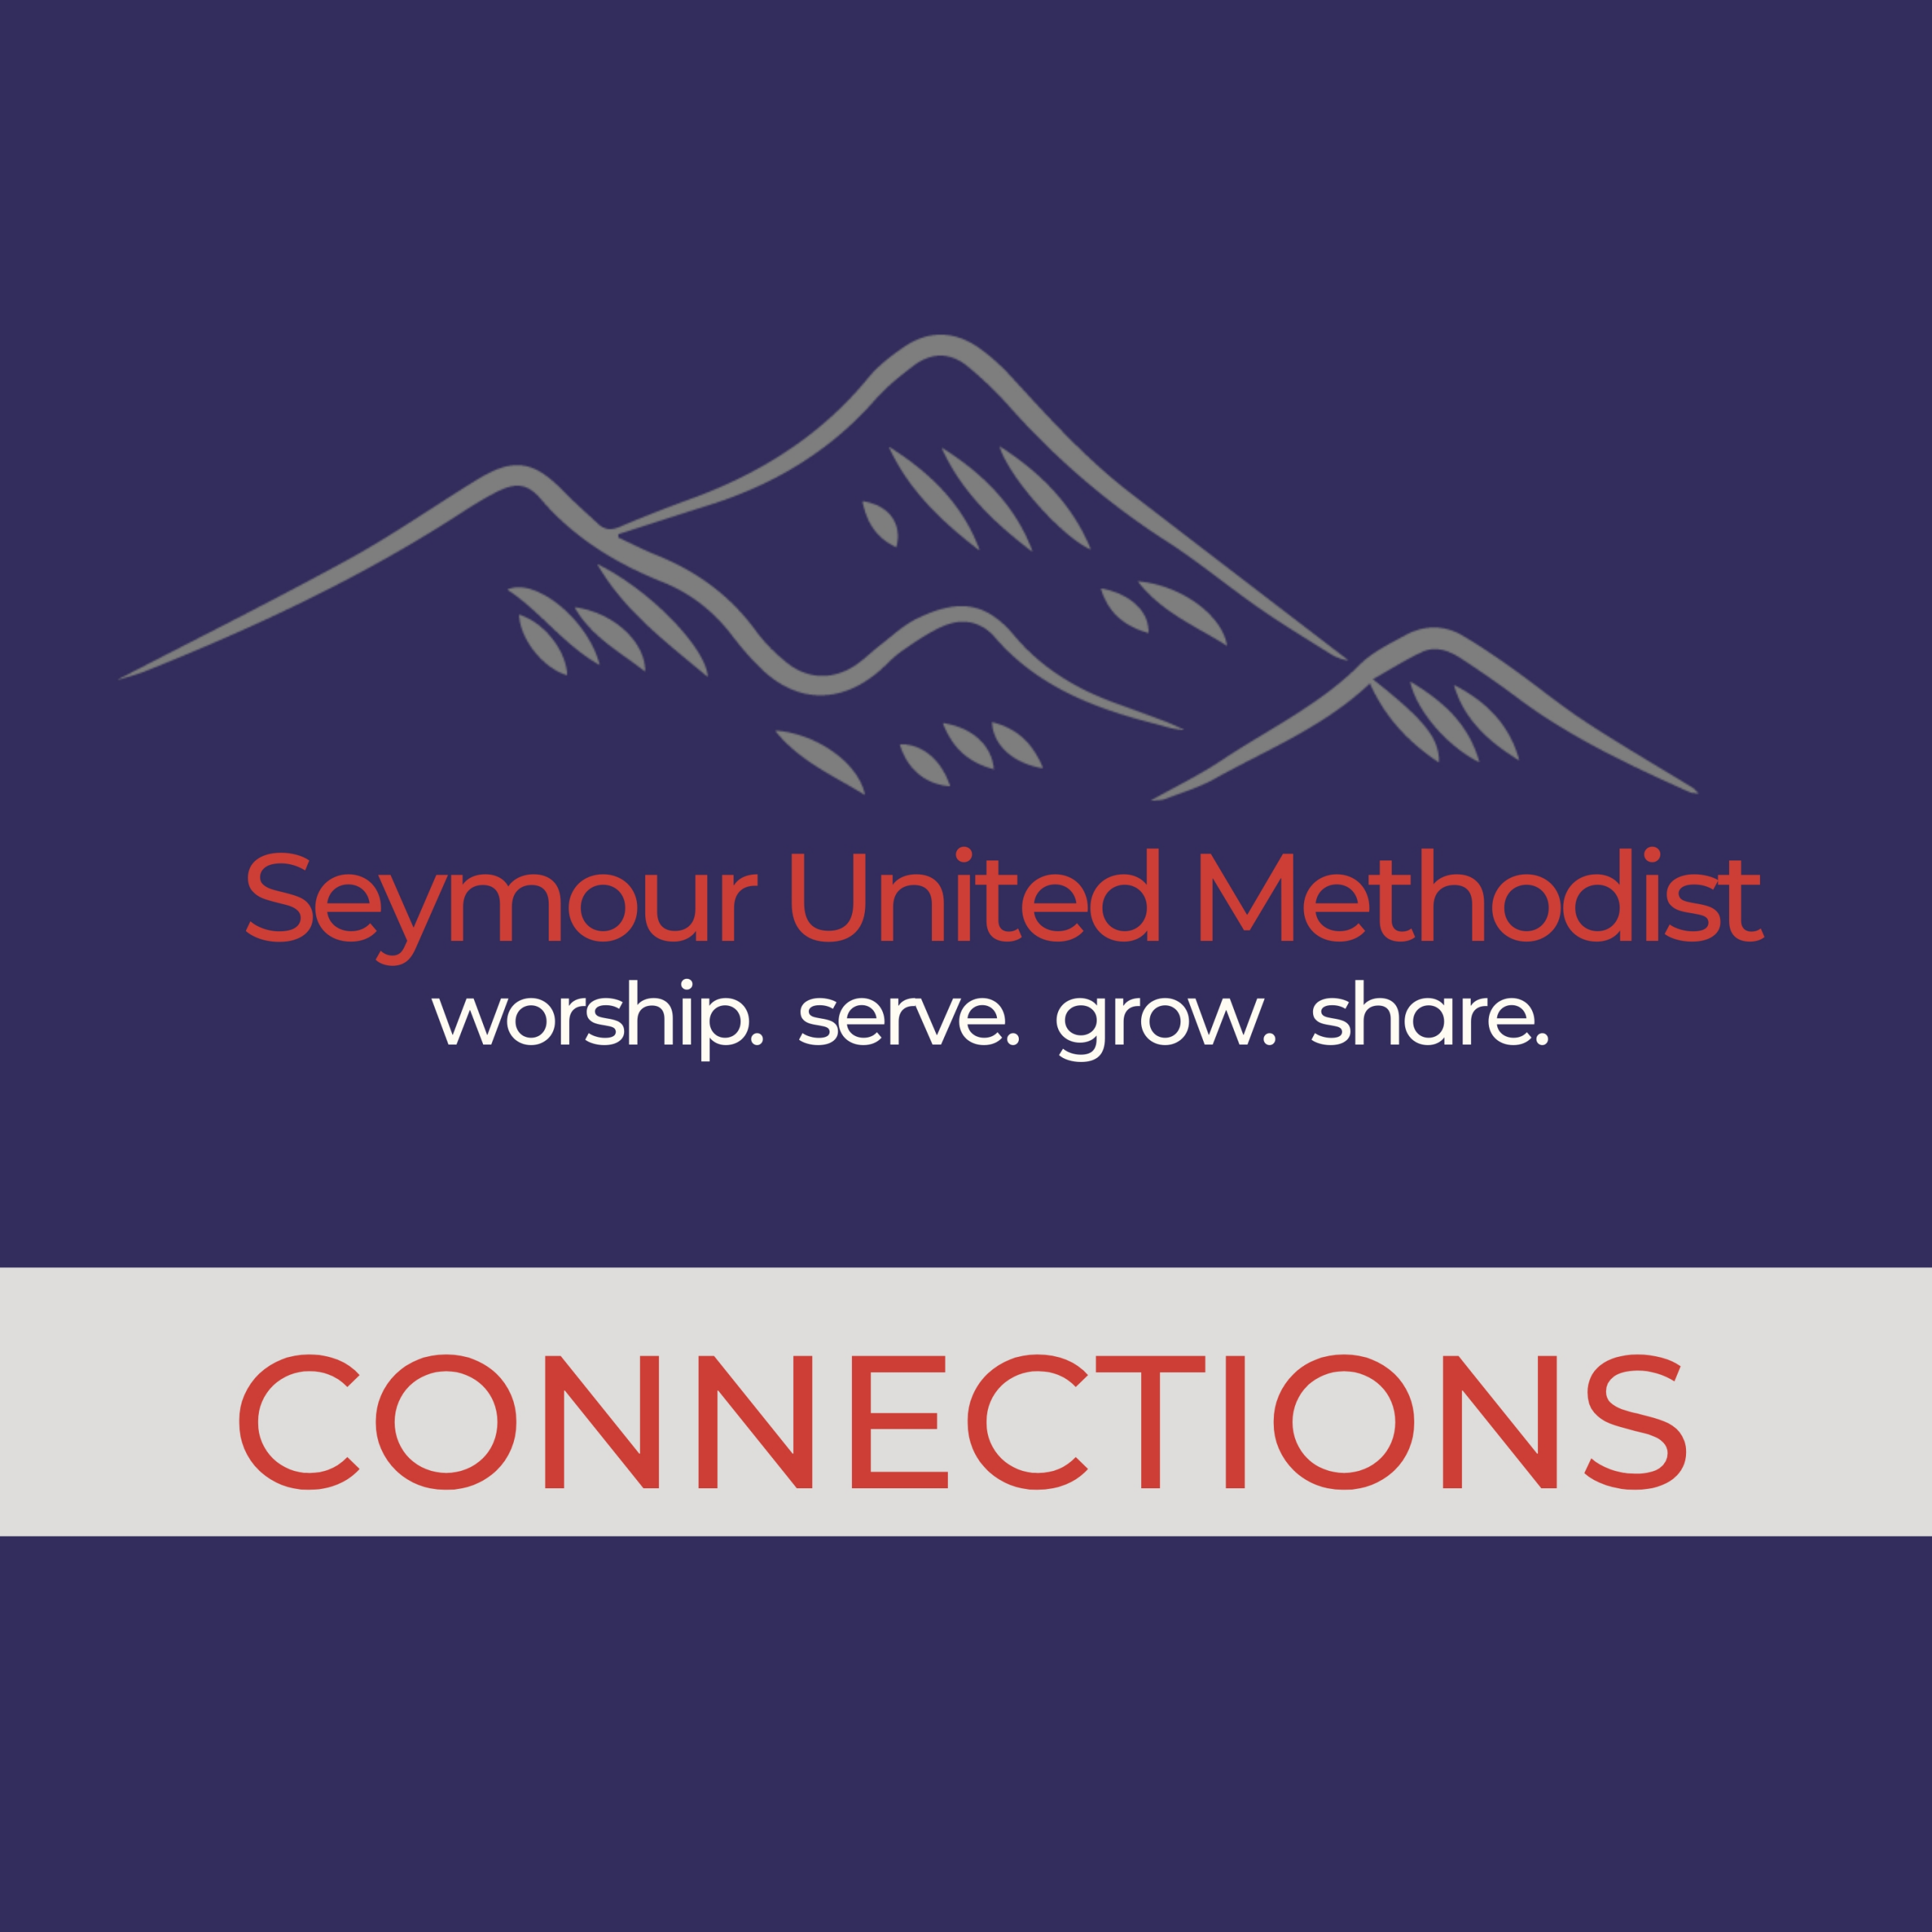 Connections With Seymour United Methodist Church  Lecioanary Umc 2020